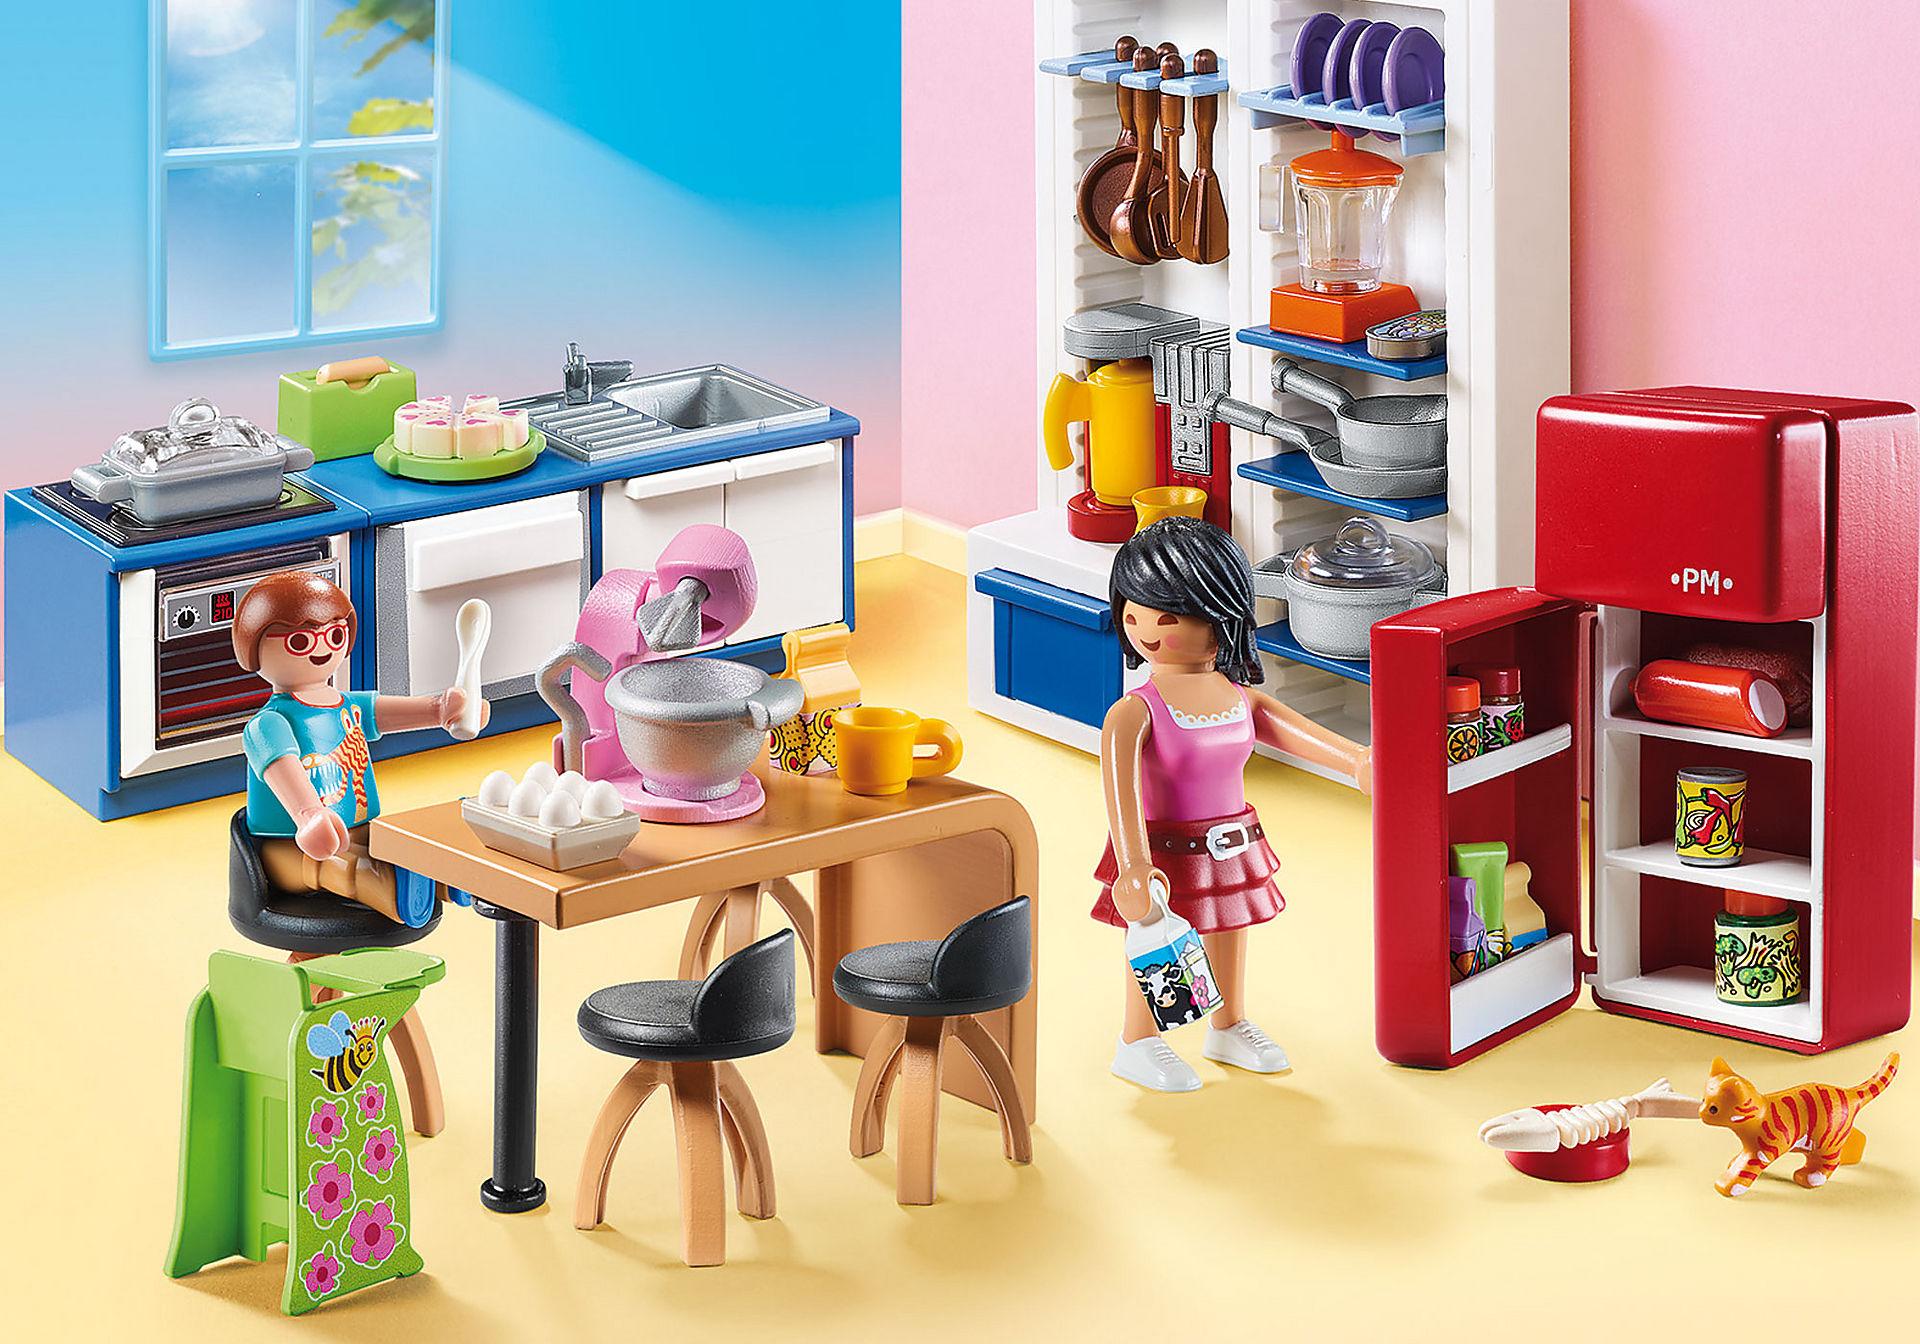 70206 Cuisine familiale  zoom image1